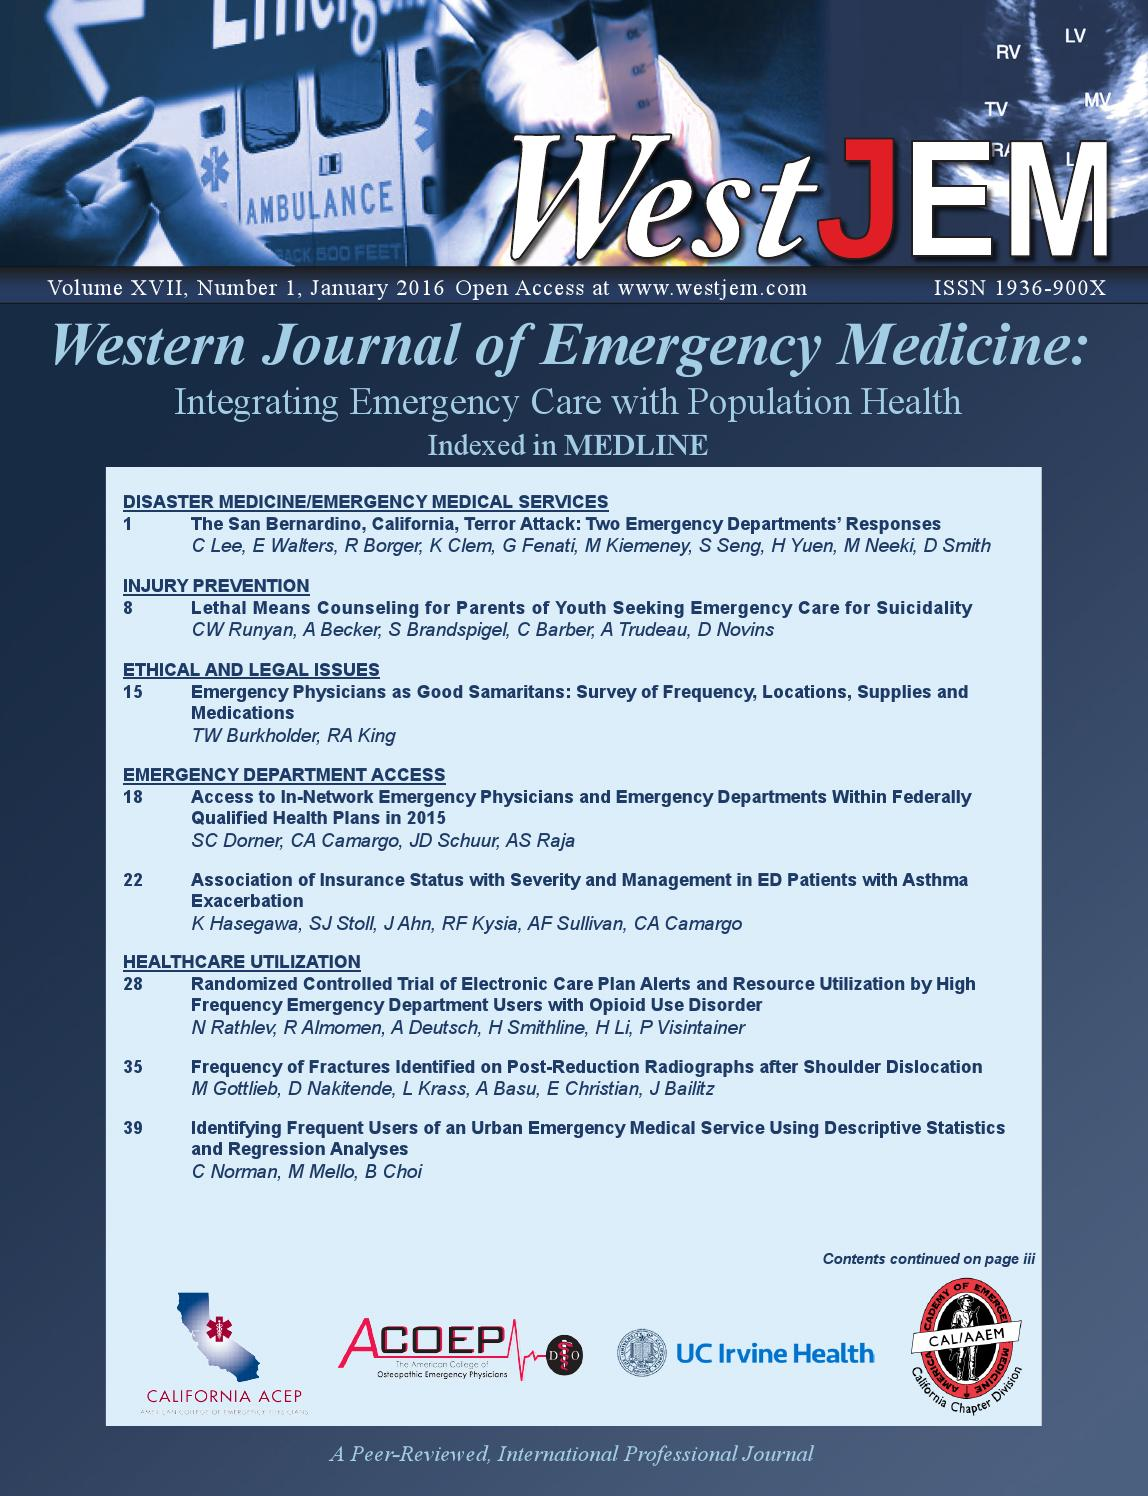 Volume 17 Issue 1 by Western Journal of Emergency Medicine - issuu